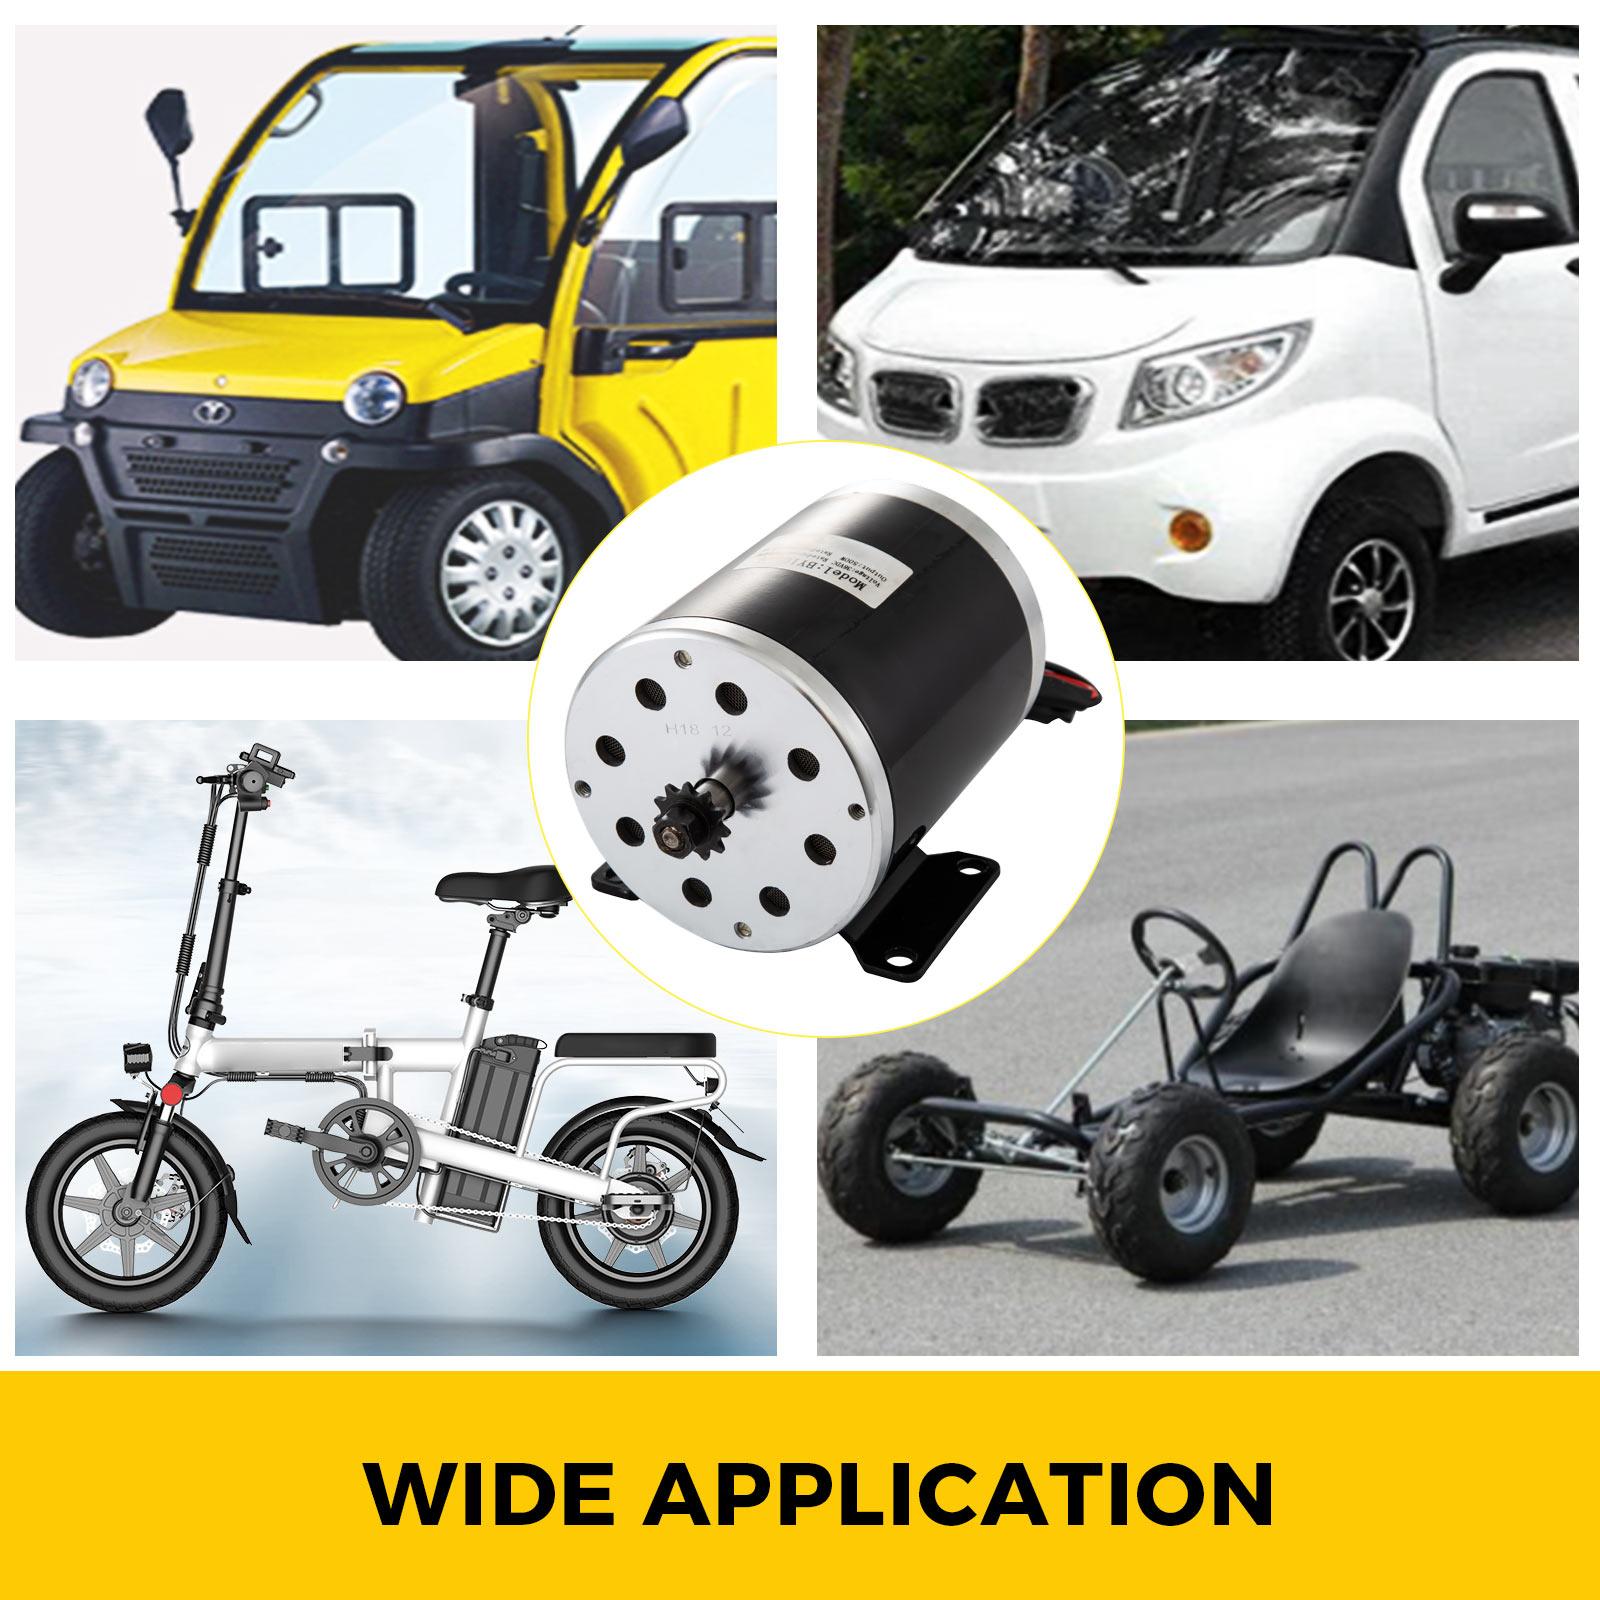 DC-electric-motor-12-60V-150W-2KW-for-scooter-bike-go-kart-minibike-e-ATV thumbnail 91